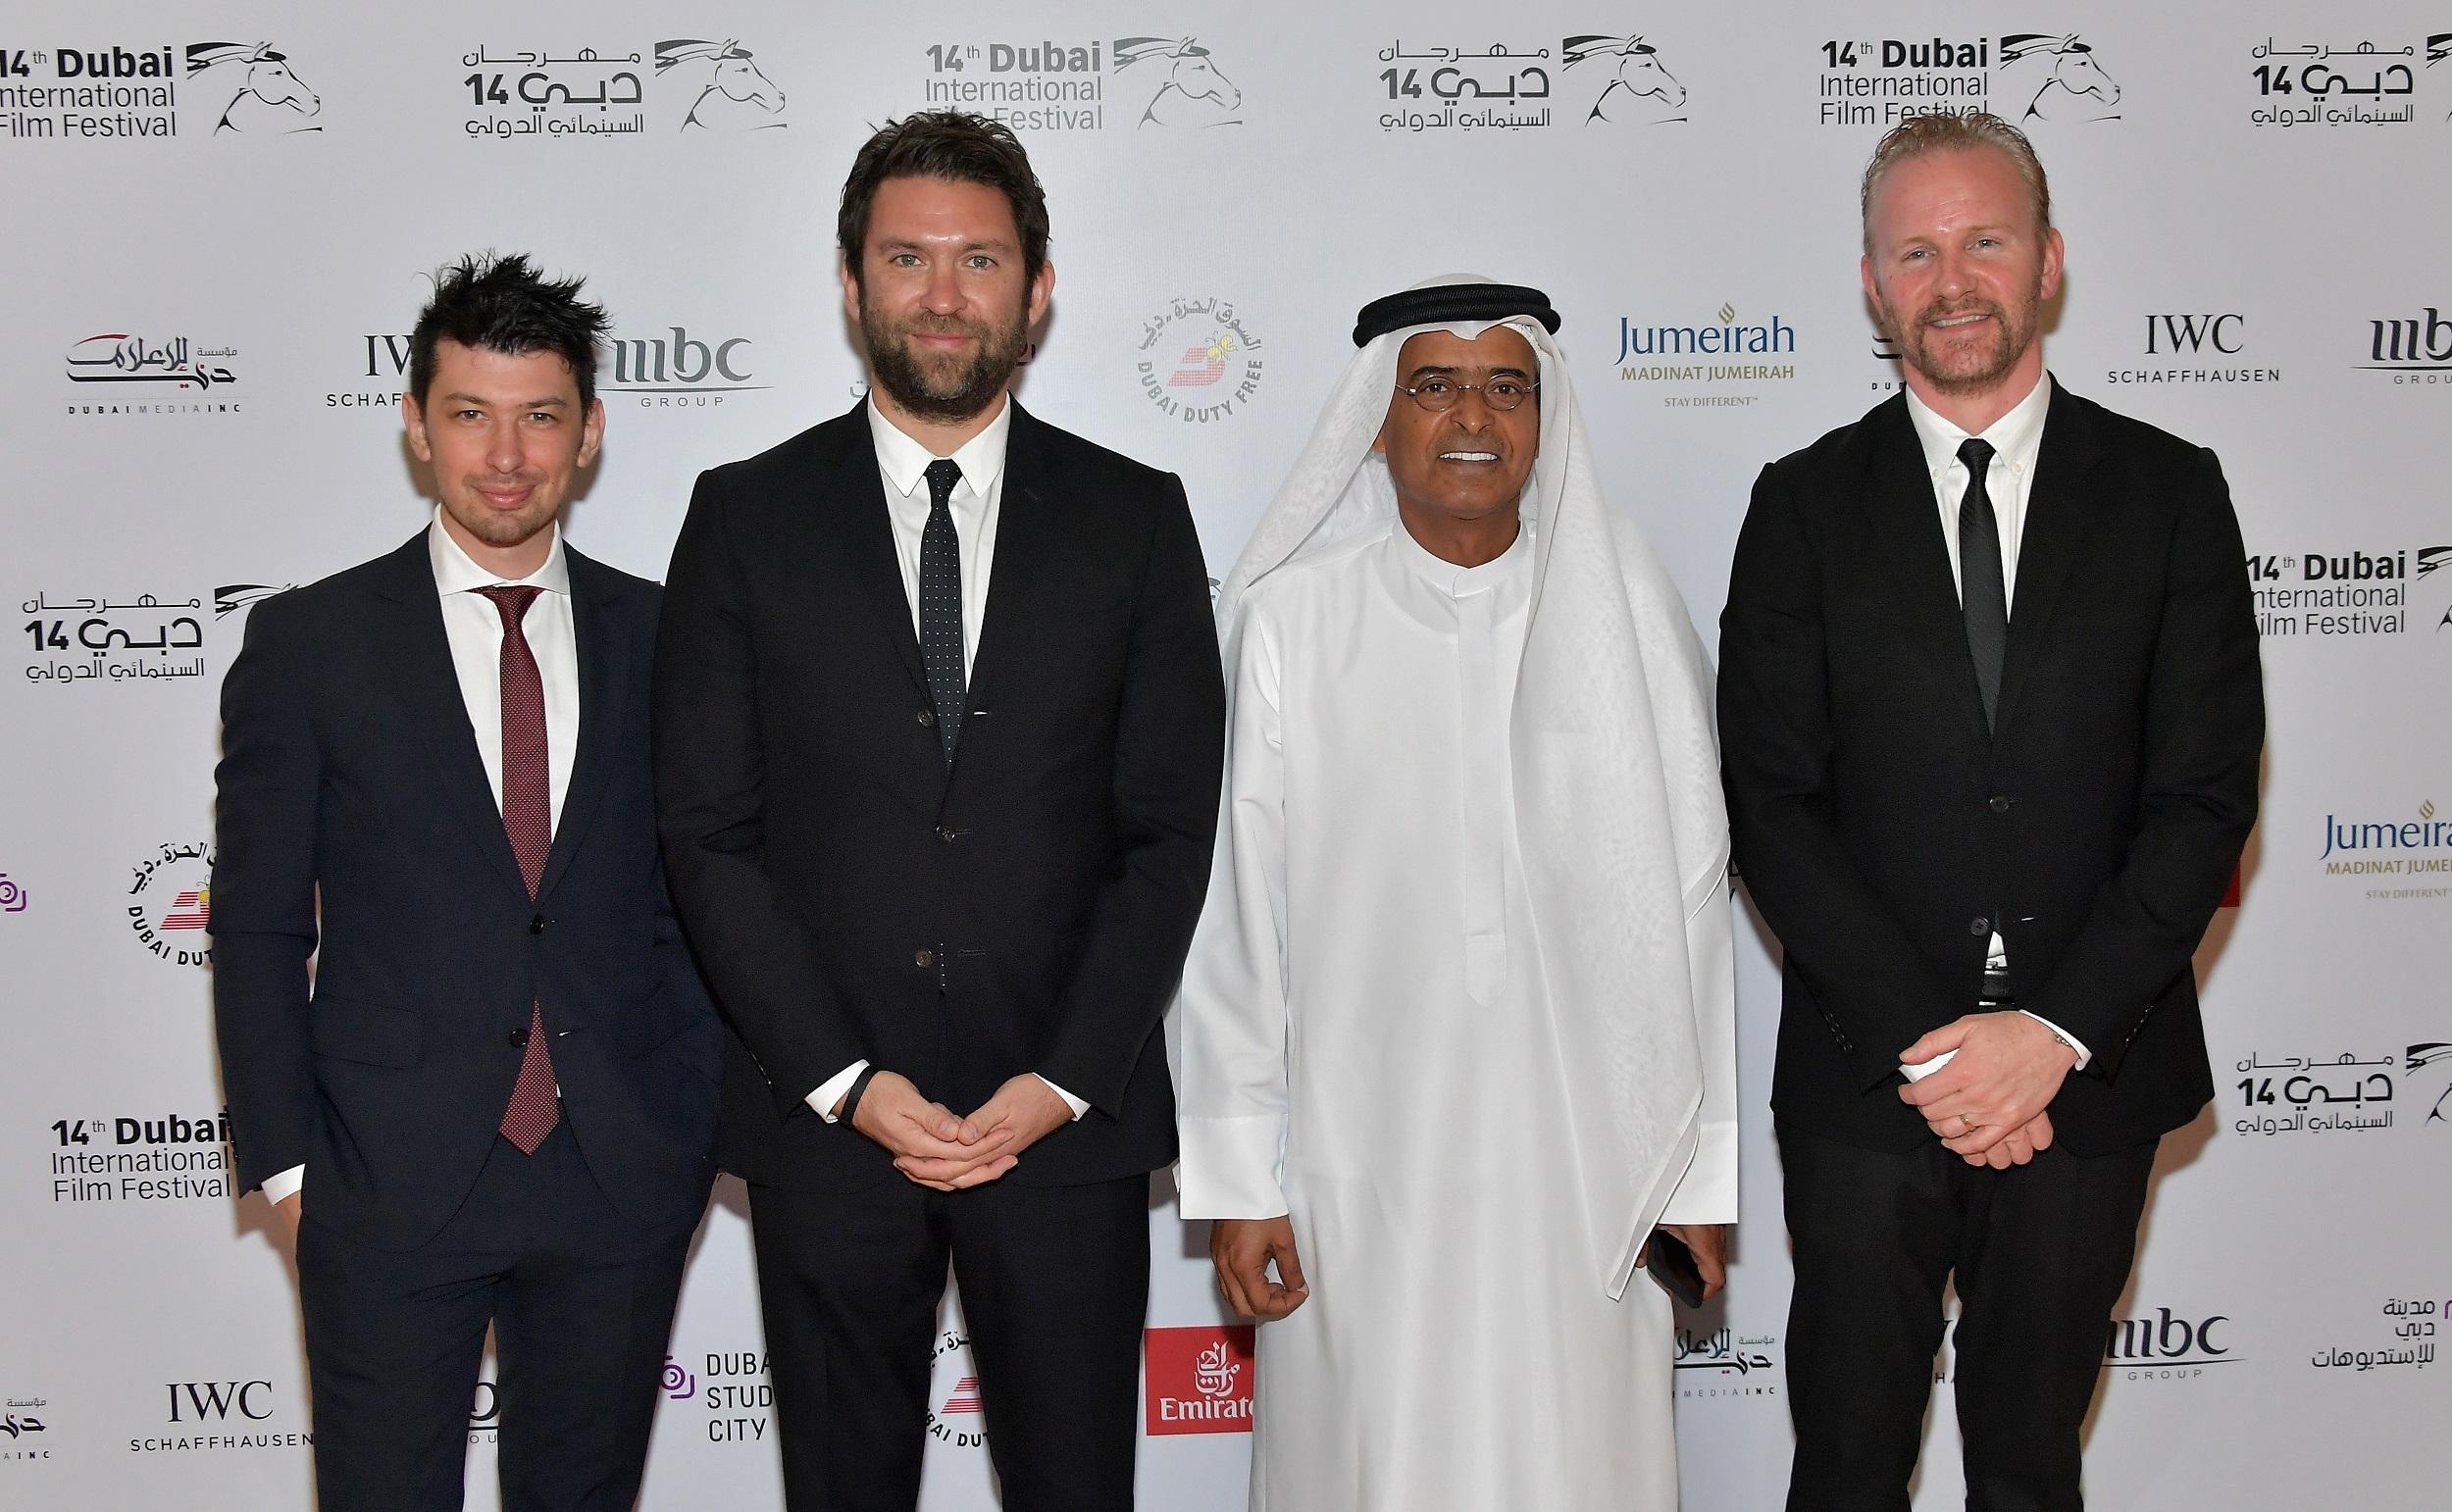 Jeremy Chilnick, Matthew Galkin, Abdulhamid Juma, Morgan Spurlock present at Dubai International Film Festival.